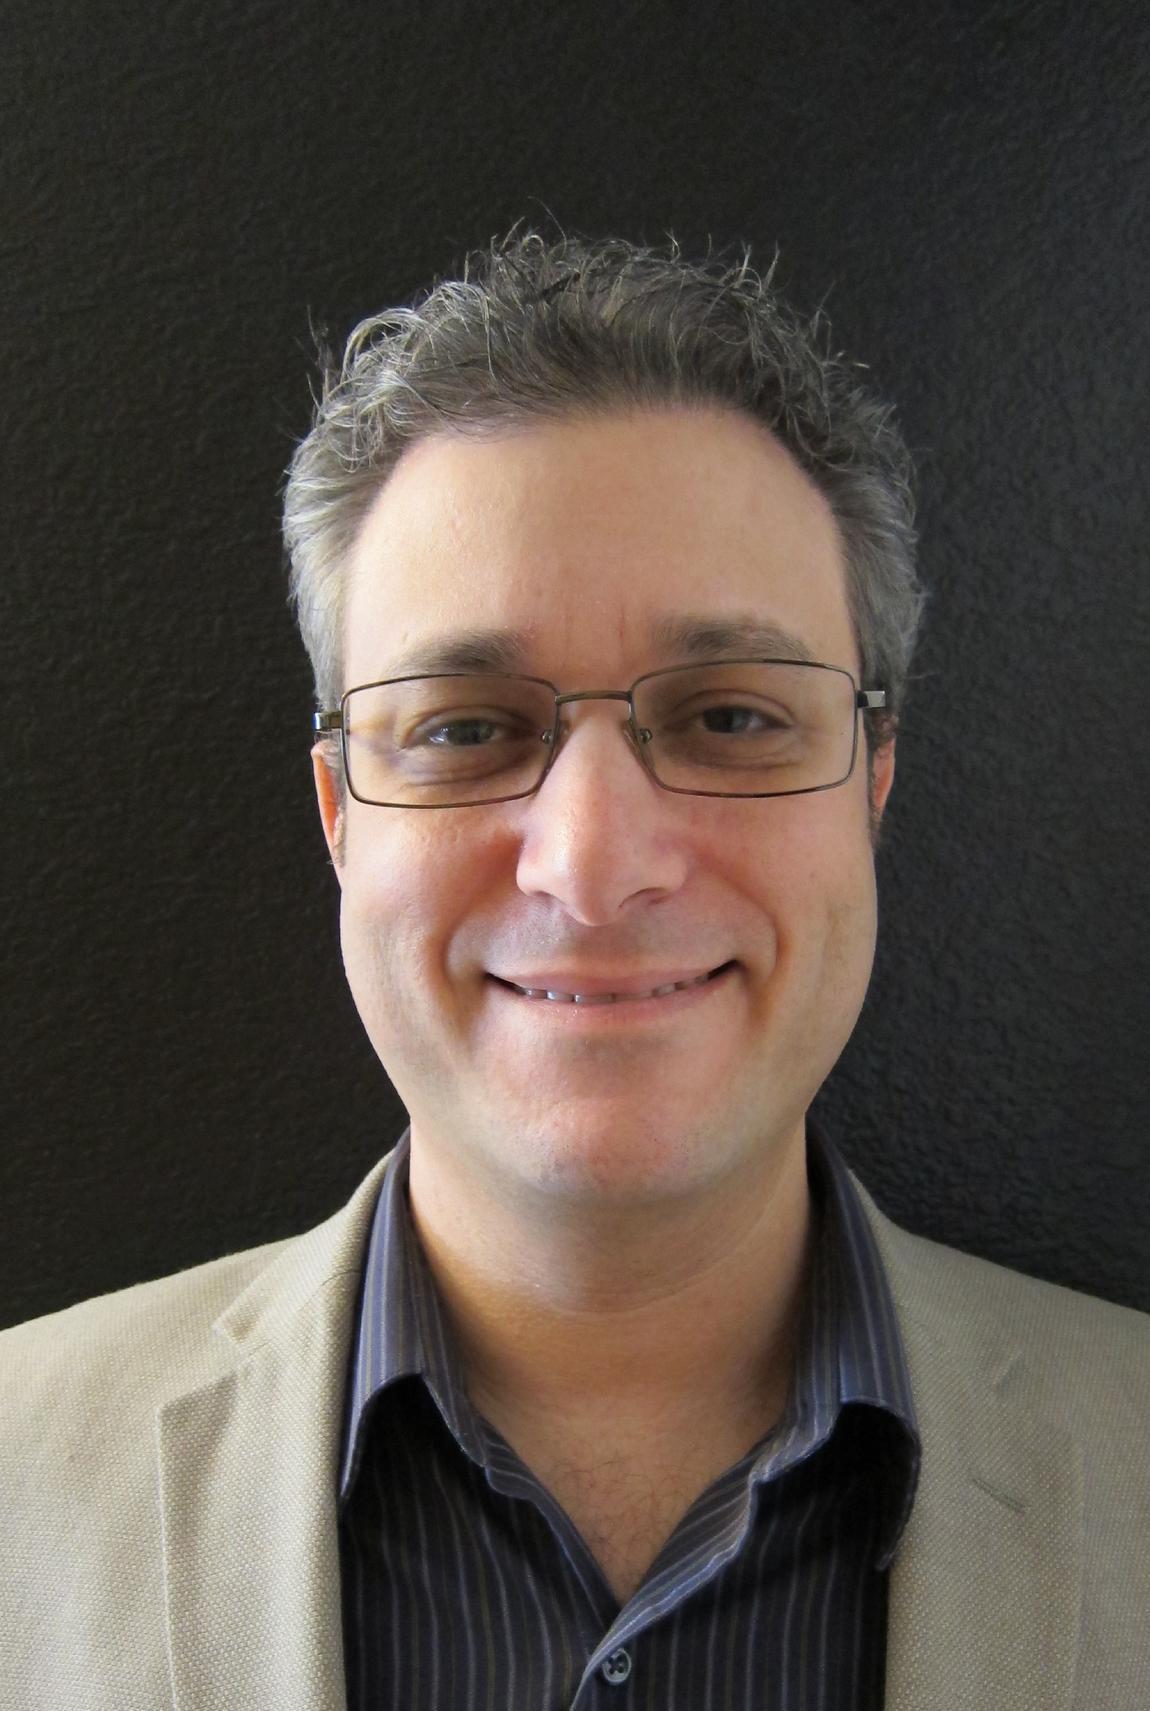 Jason 'Wolf' Rosenberg